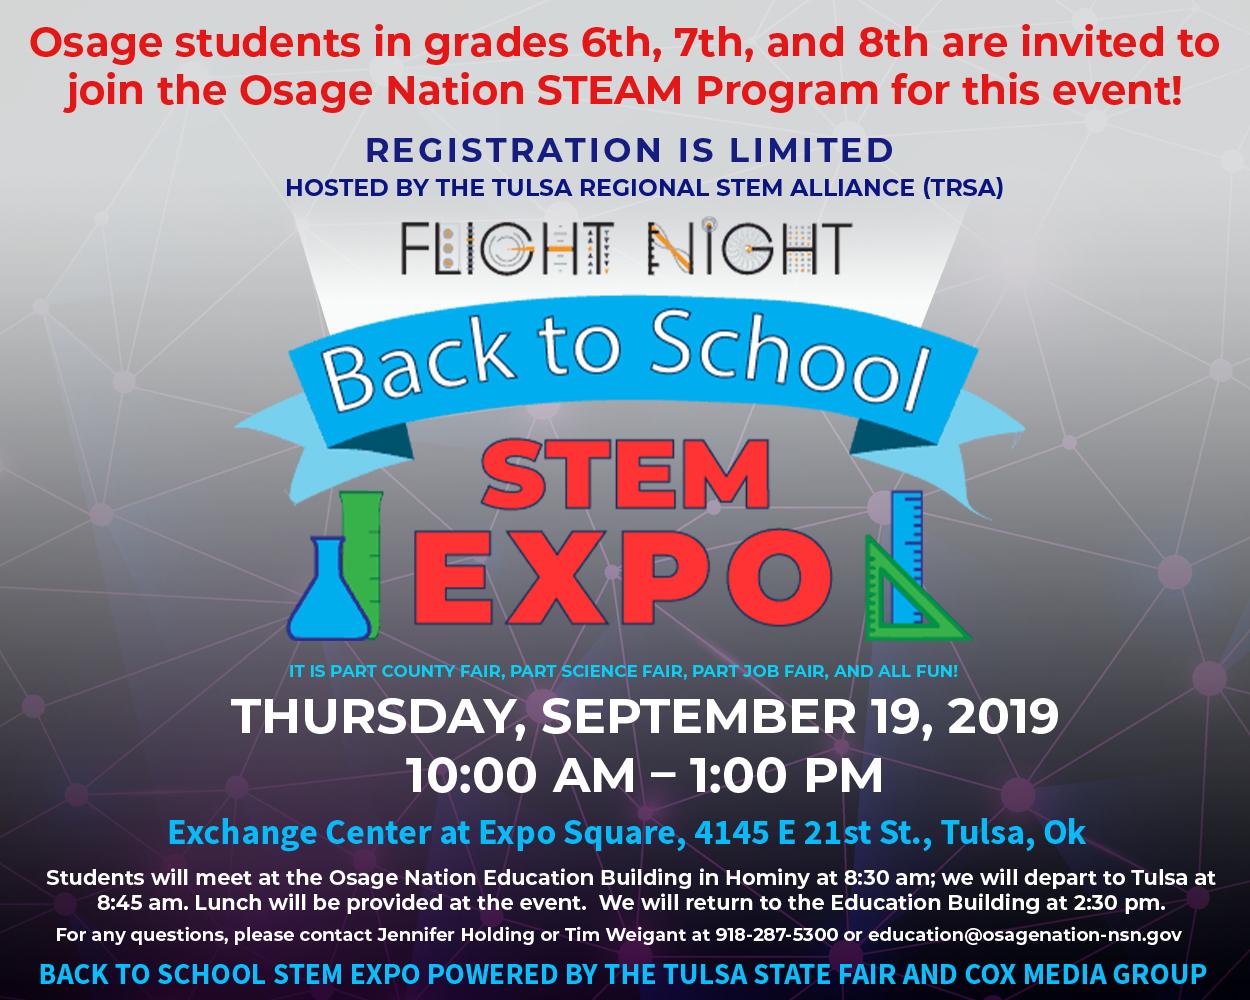 flyer for Flight Night Back to School Stem Expo